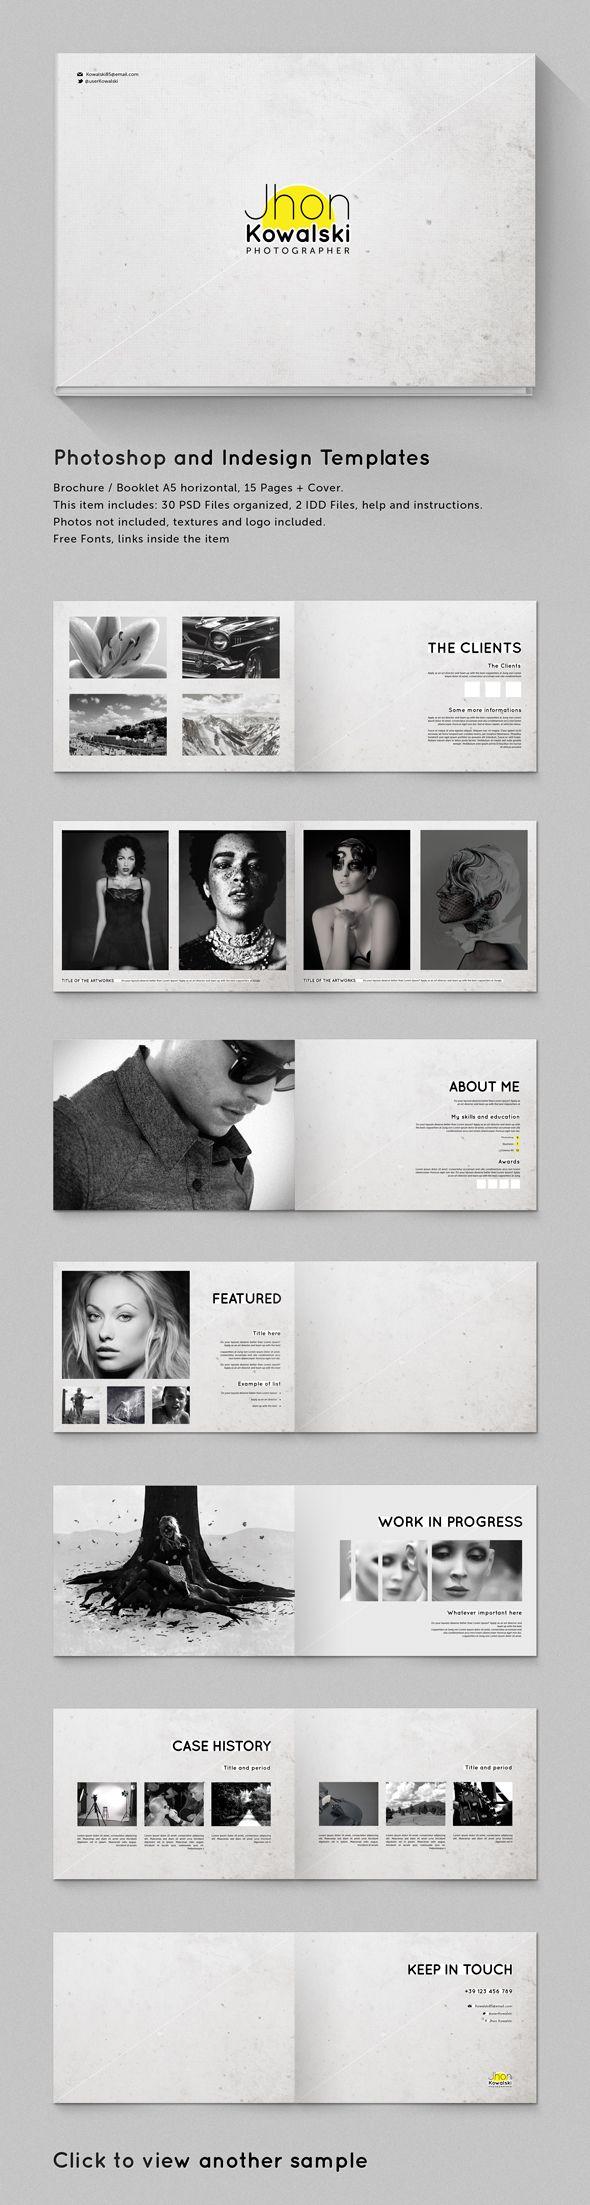 A5 Brochure - Booklet Template Minimal Portfolio by ~Giallo86 on deviantART